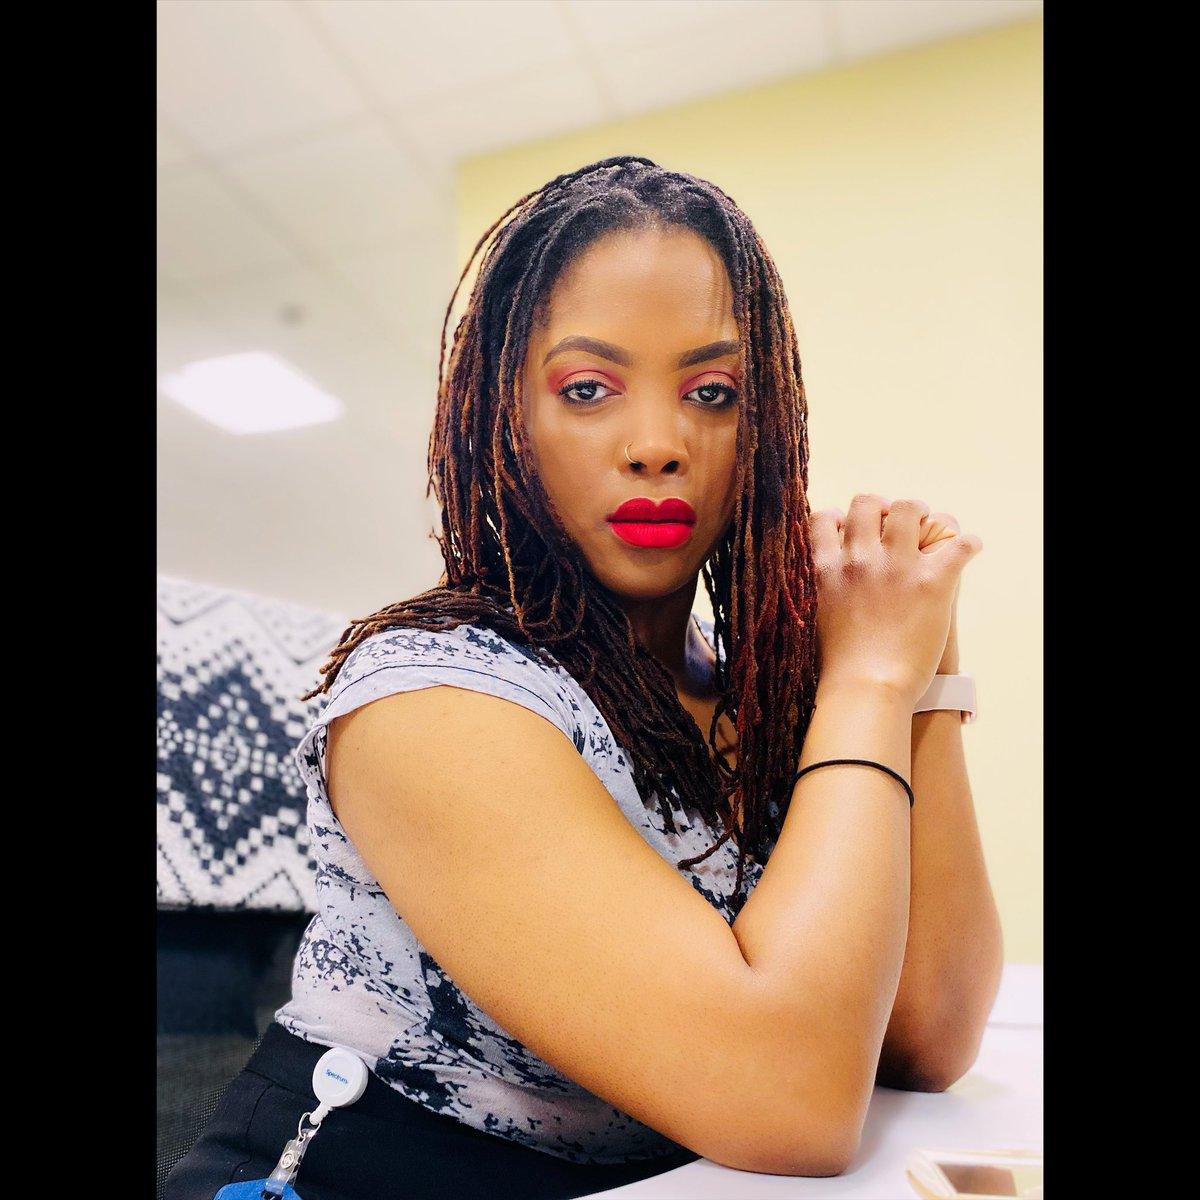 It's Friday, let's make the best of it!✨💋 #melanin #melaninpoppin #beauty #mua #blackhistorymonth #blackgirlmagic #blackexcellence #motivation #friday #weekend #vibes #stl #pretty #makeup #lipstick #matte #wetnwild #beautiful #gorgeous